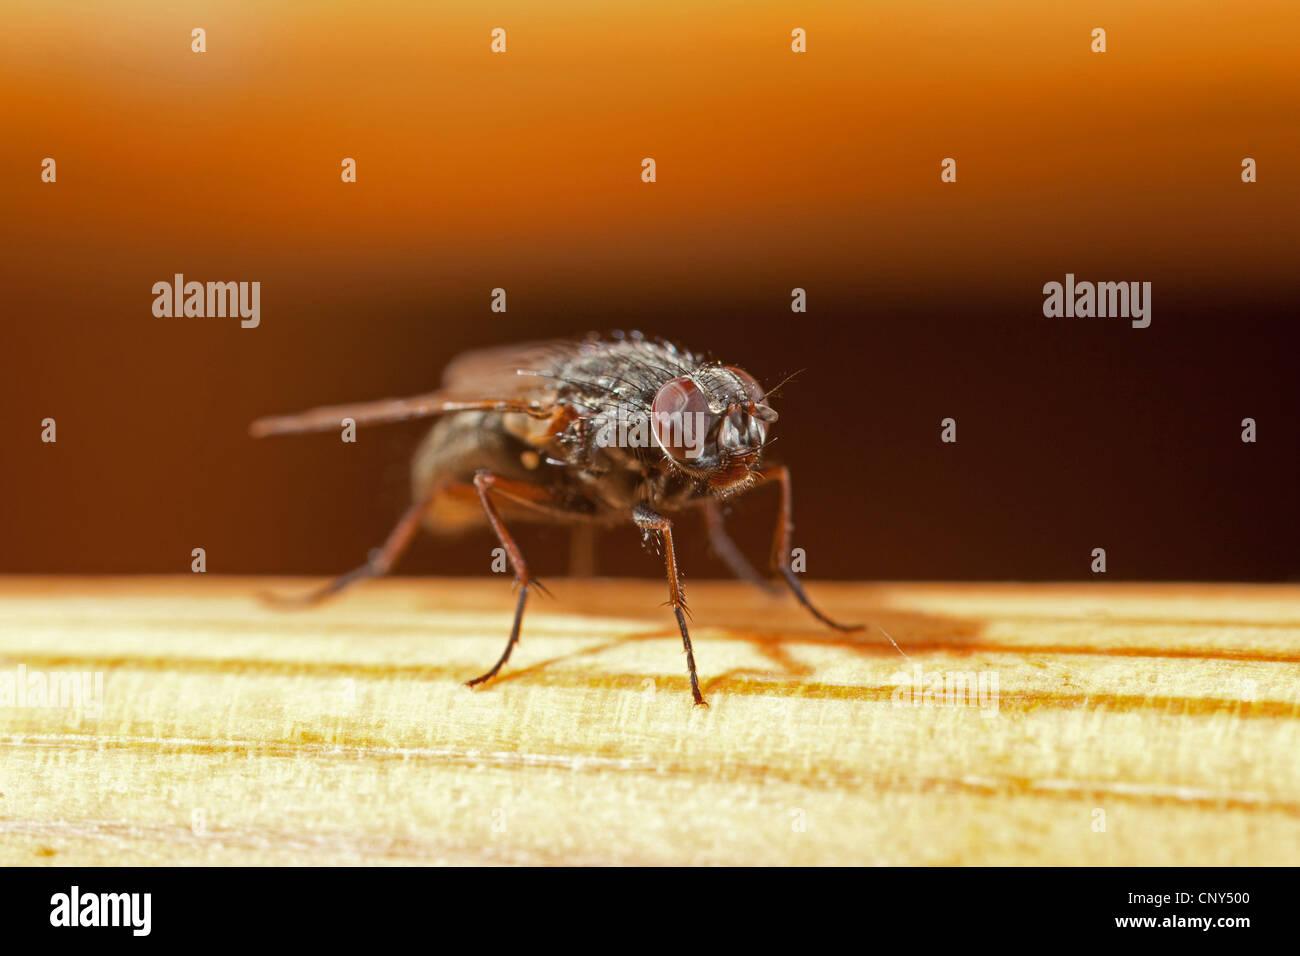 geringerem Haus fliegen (fliegen Canicularis), Makro erschossen, Deutschland, Bayern Stockbild